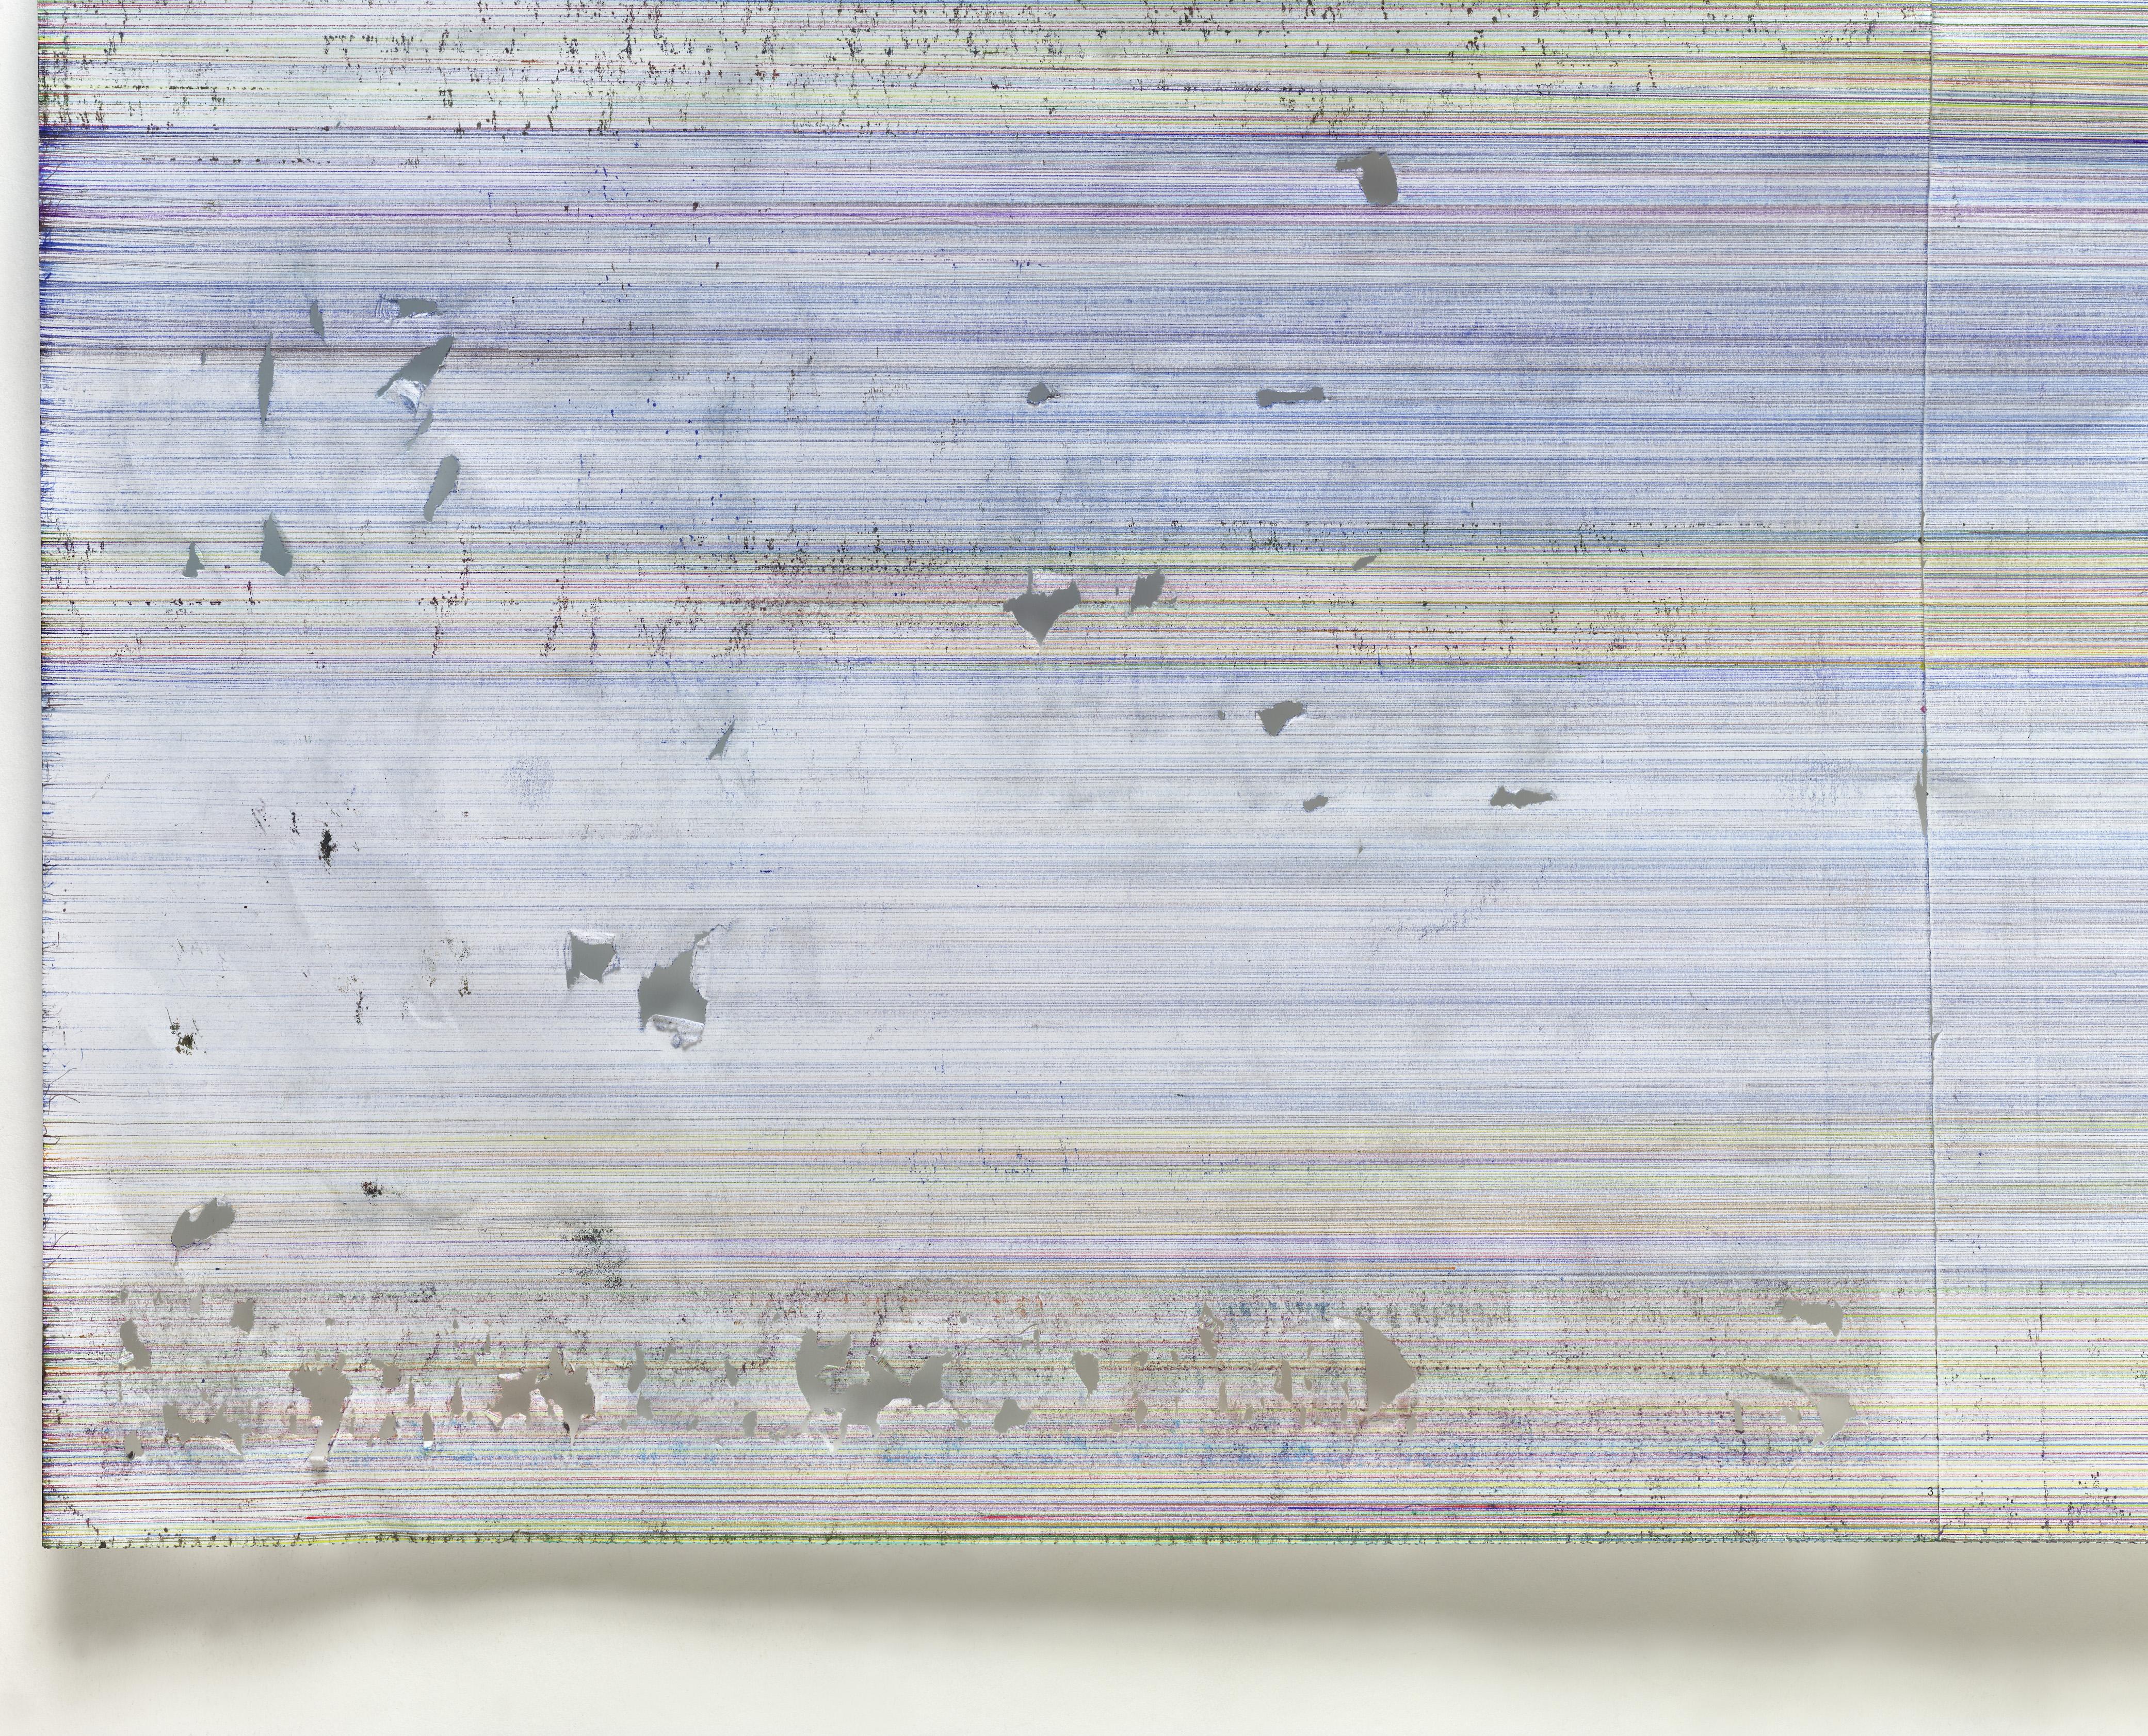 121c-a-rhythm-of-landscape-9-detail-2